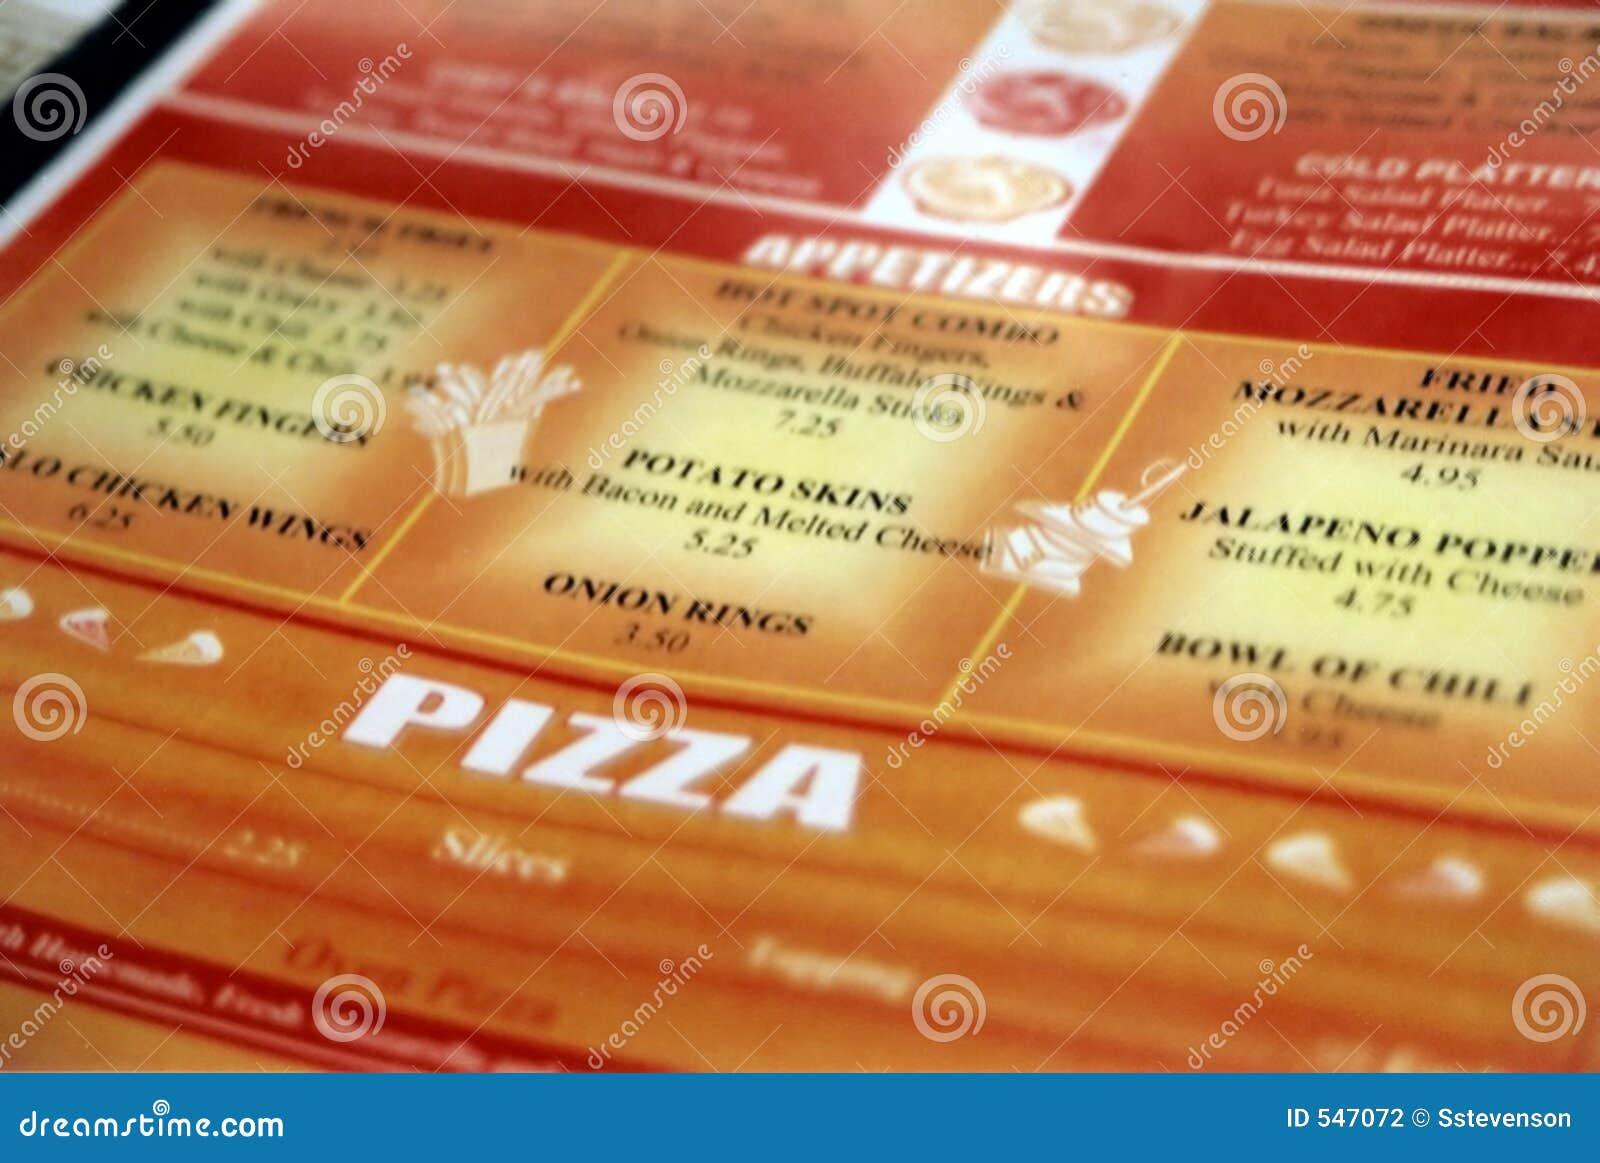 Download 菜单 库存照片. 图片 包括有 素瓷, 营养, 卡路里, 列表, 选择, 用餐, 挑库, 墨西哥胡椒, 无盐干酪 - 547072